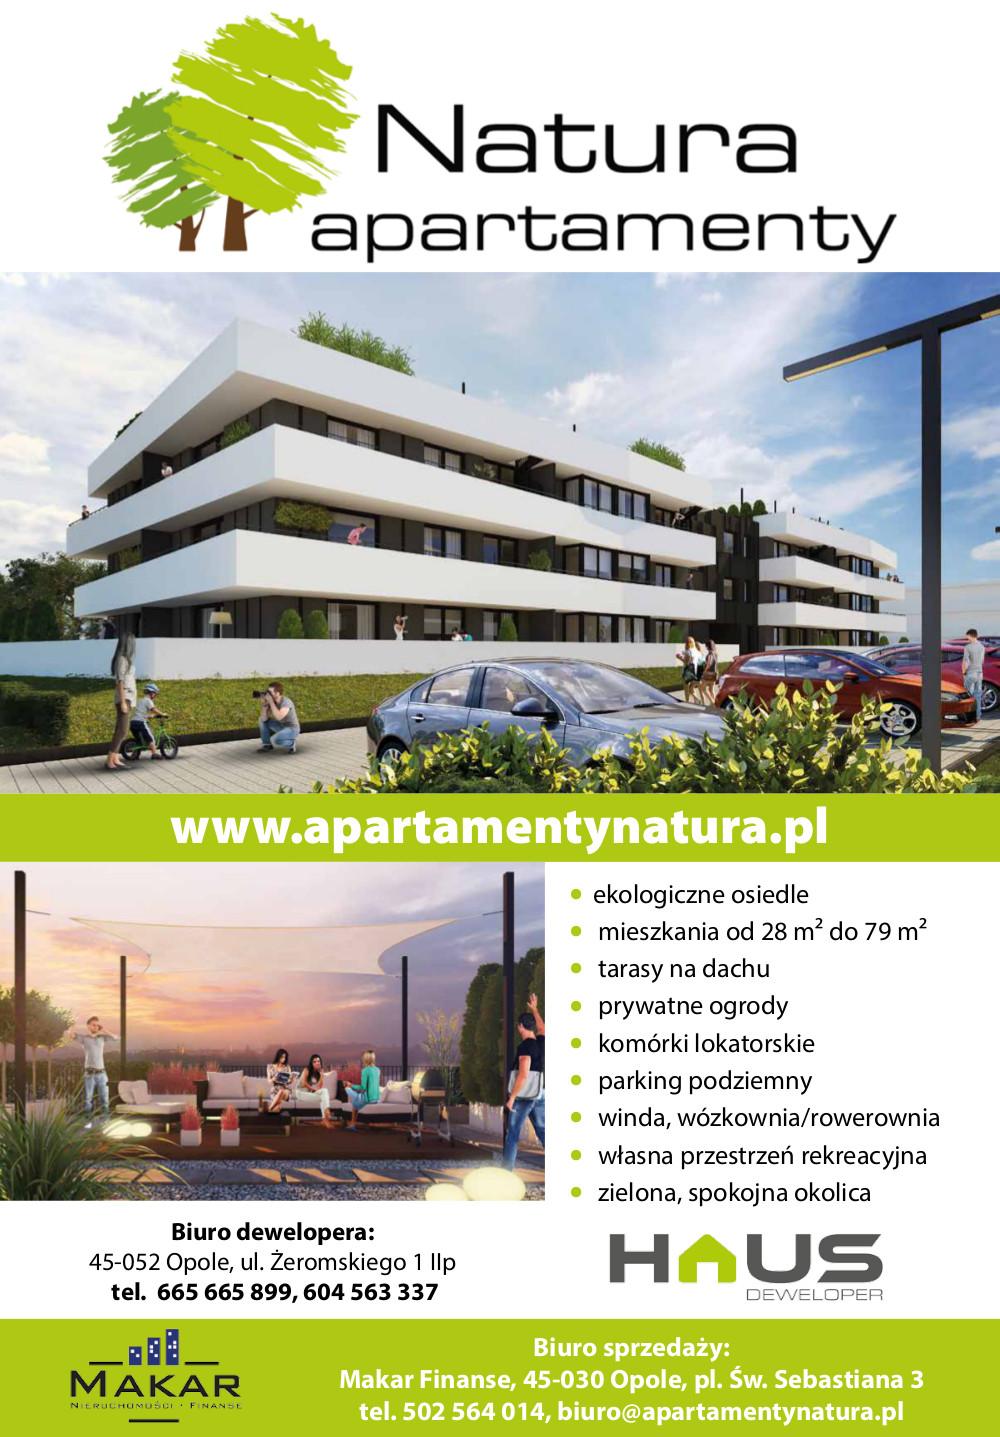 Apartamenty Natura - Opolski Rynek Nieruchomosci 05-2017